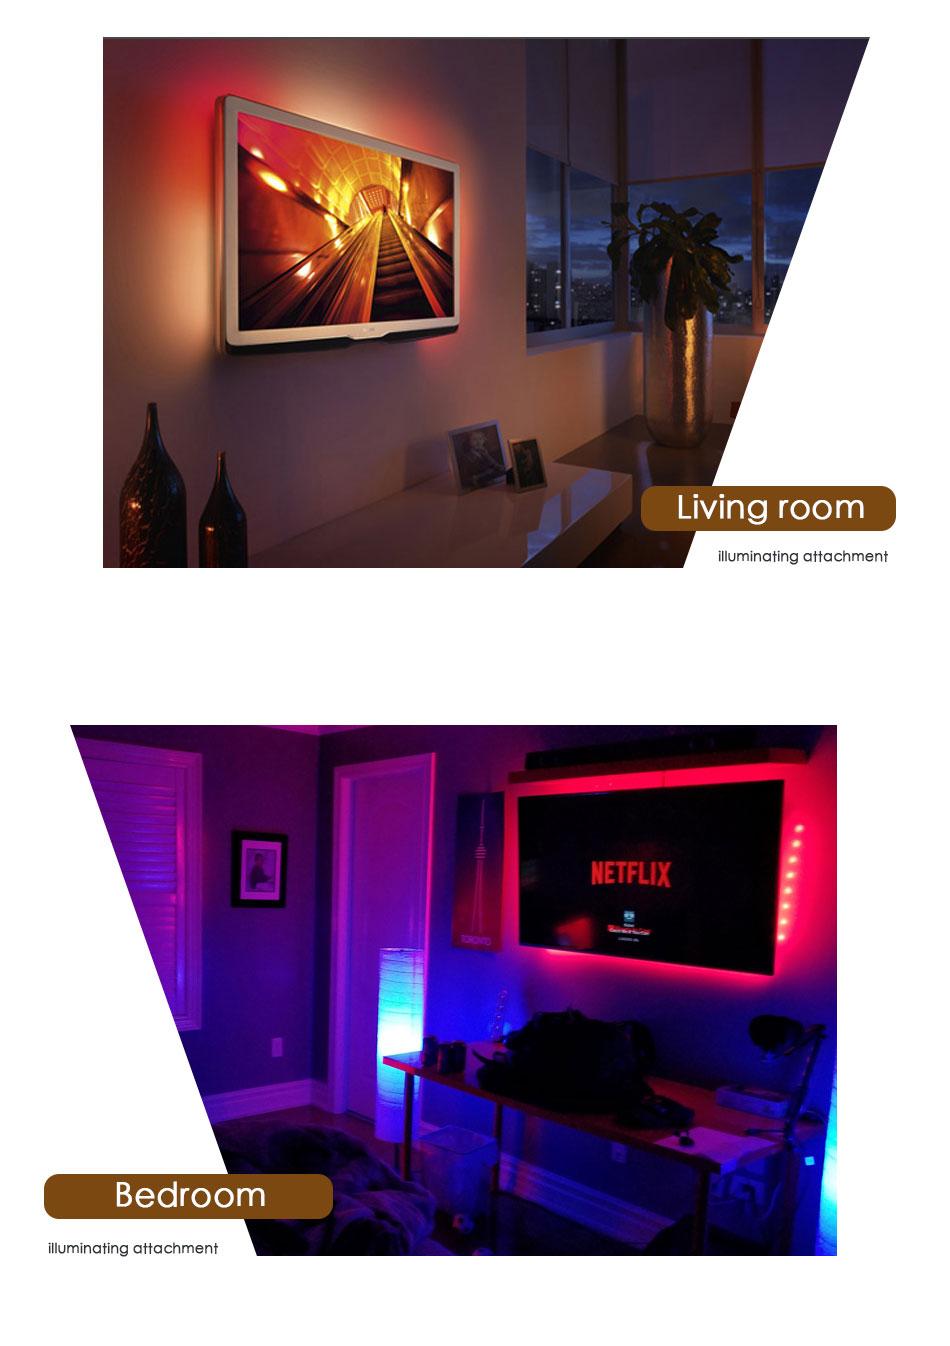 DC 5V LED Strip 3Key USB Cable Power Flexible Light Lamp 50CM 1M 2M 3M 4M 5M SMD 2835 Desk Screen Tape TV Background Lighting